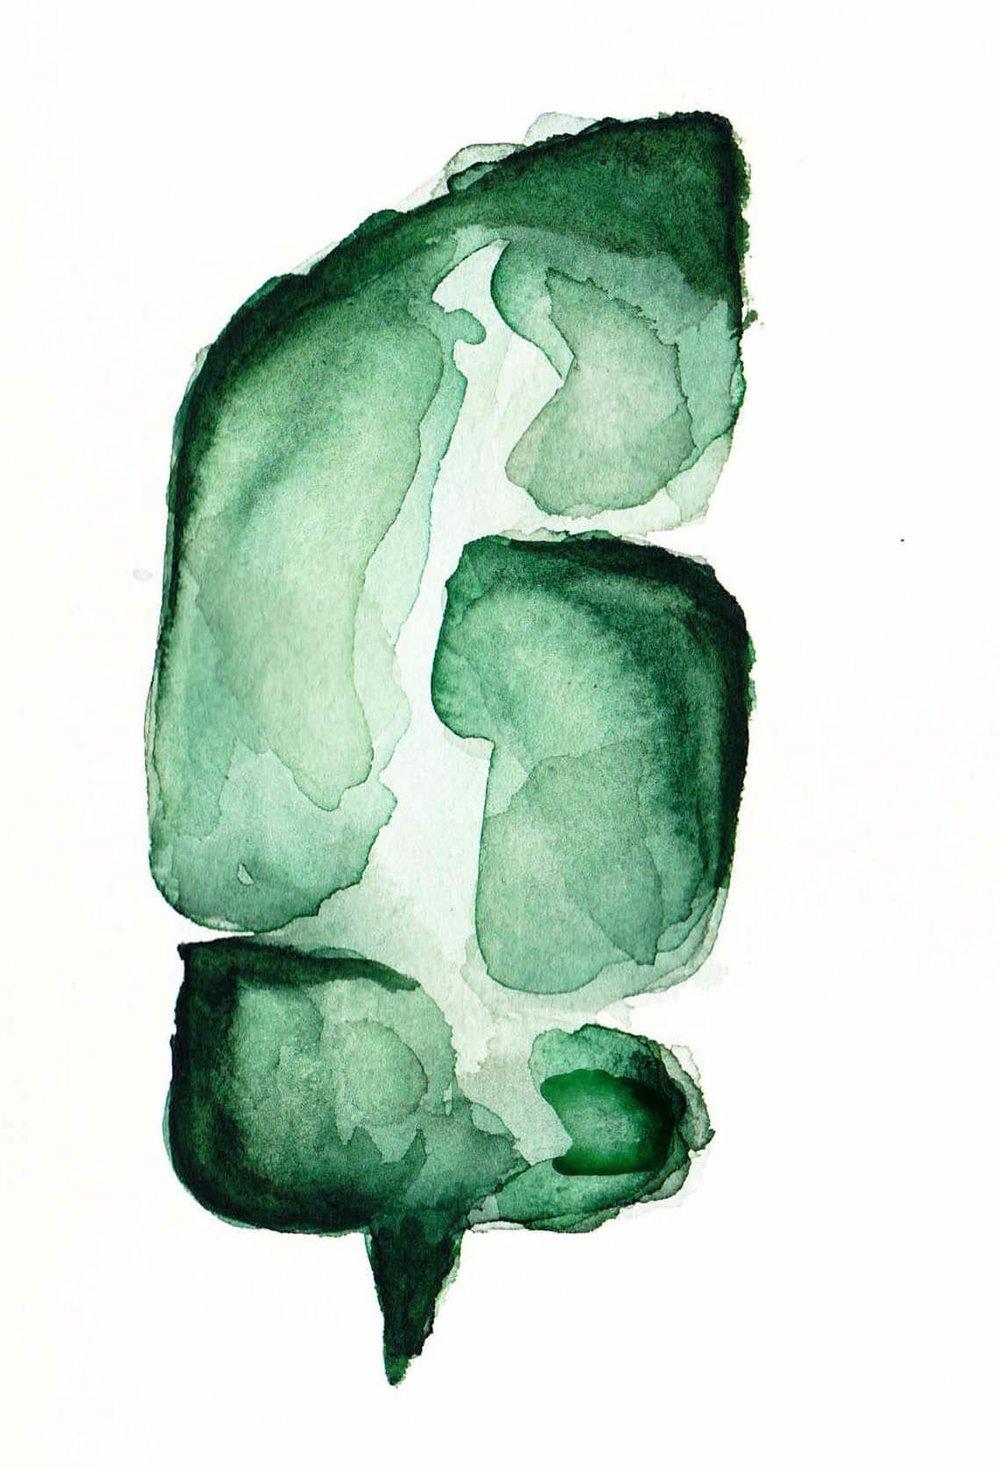 101_04_180717_watercolour leaf 3.jpg